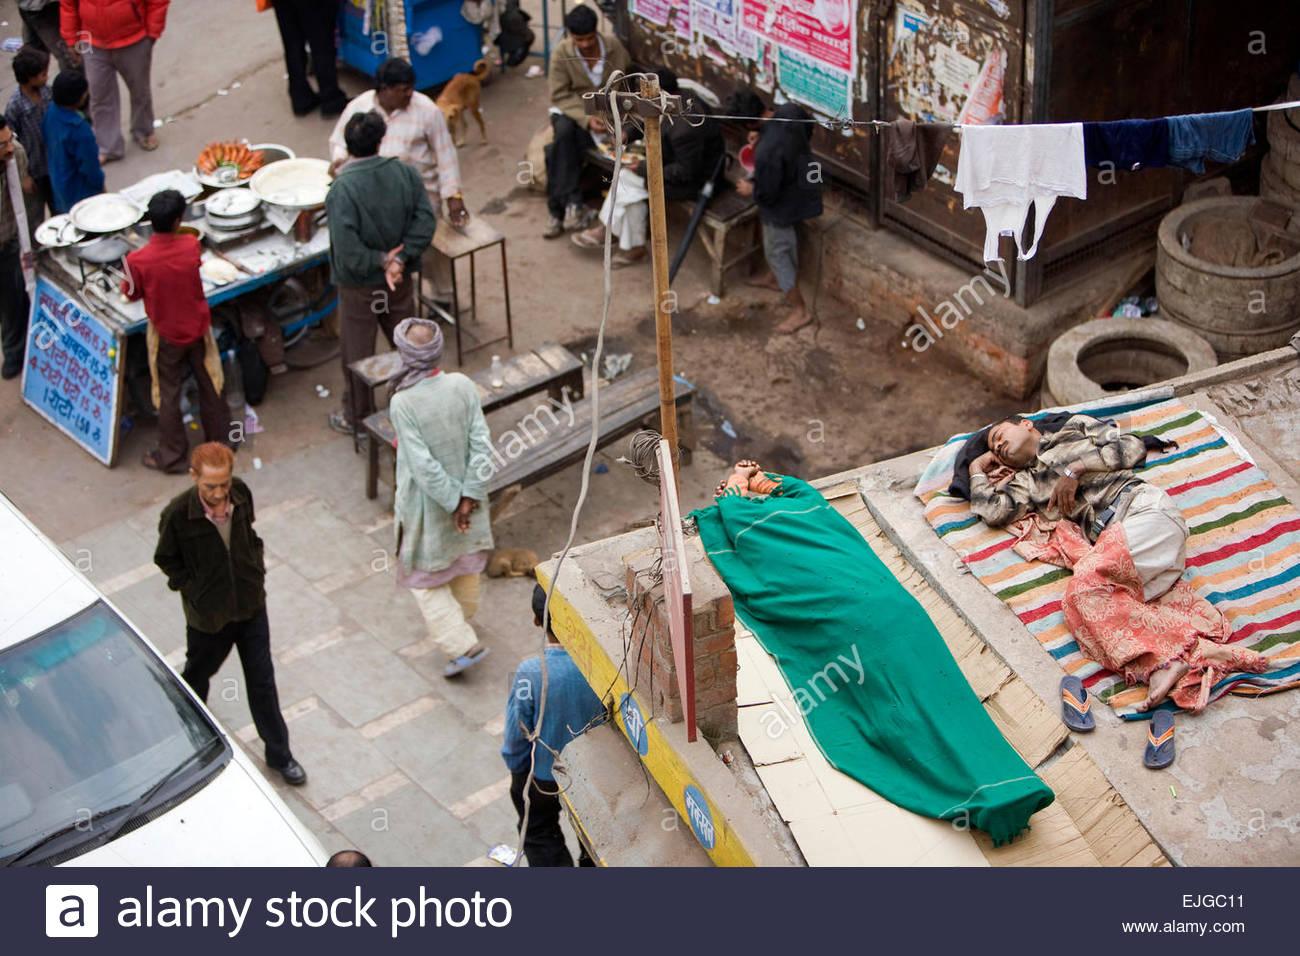 Täglichen Lebens vor dem Bahnhof, Gurgaon. Stockbild